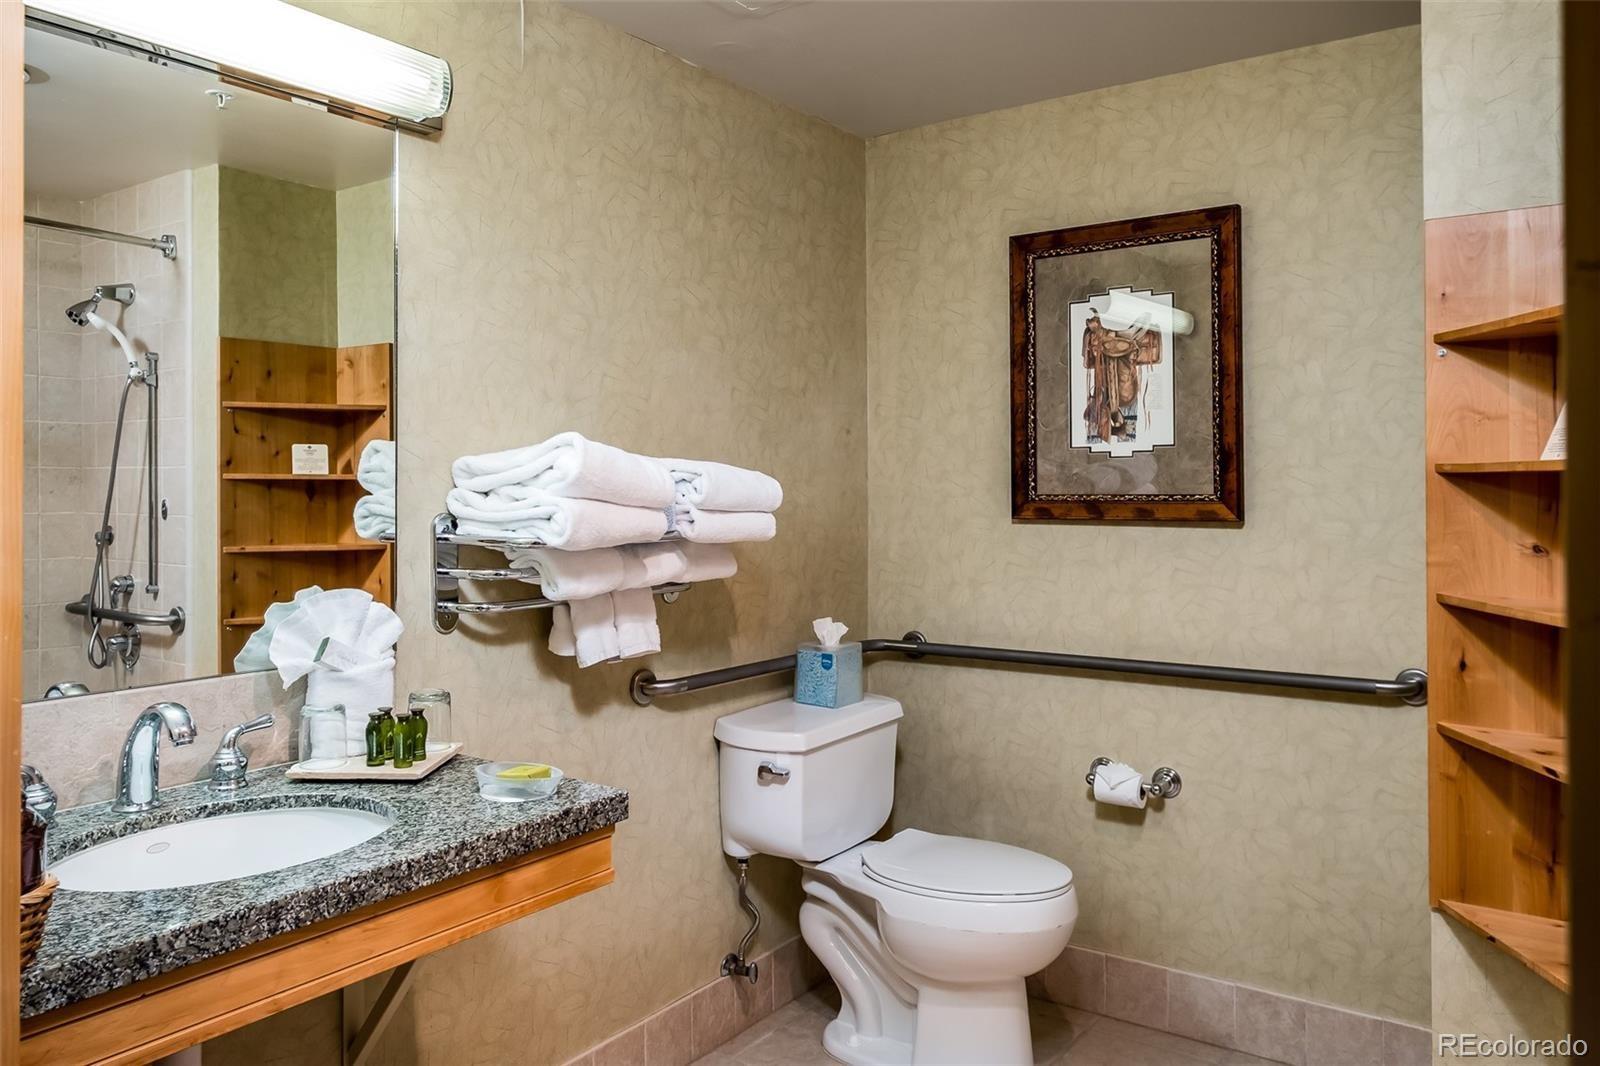 MLS# 5177815 - 1 - 2300  Mount Werner Circle, Steamboat Springs, CO 80487